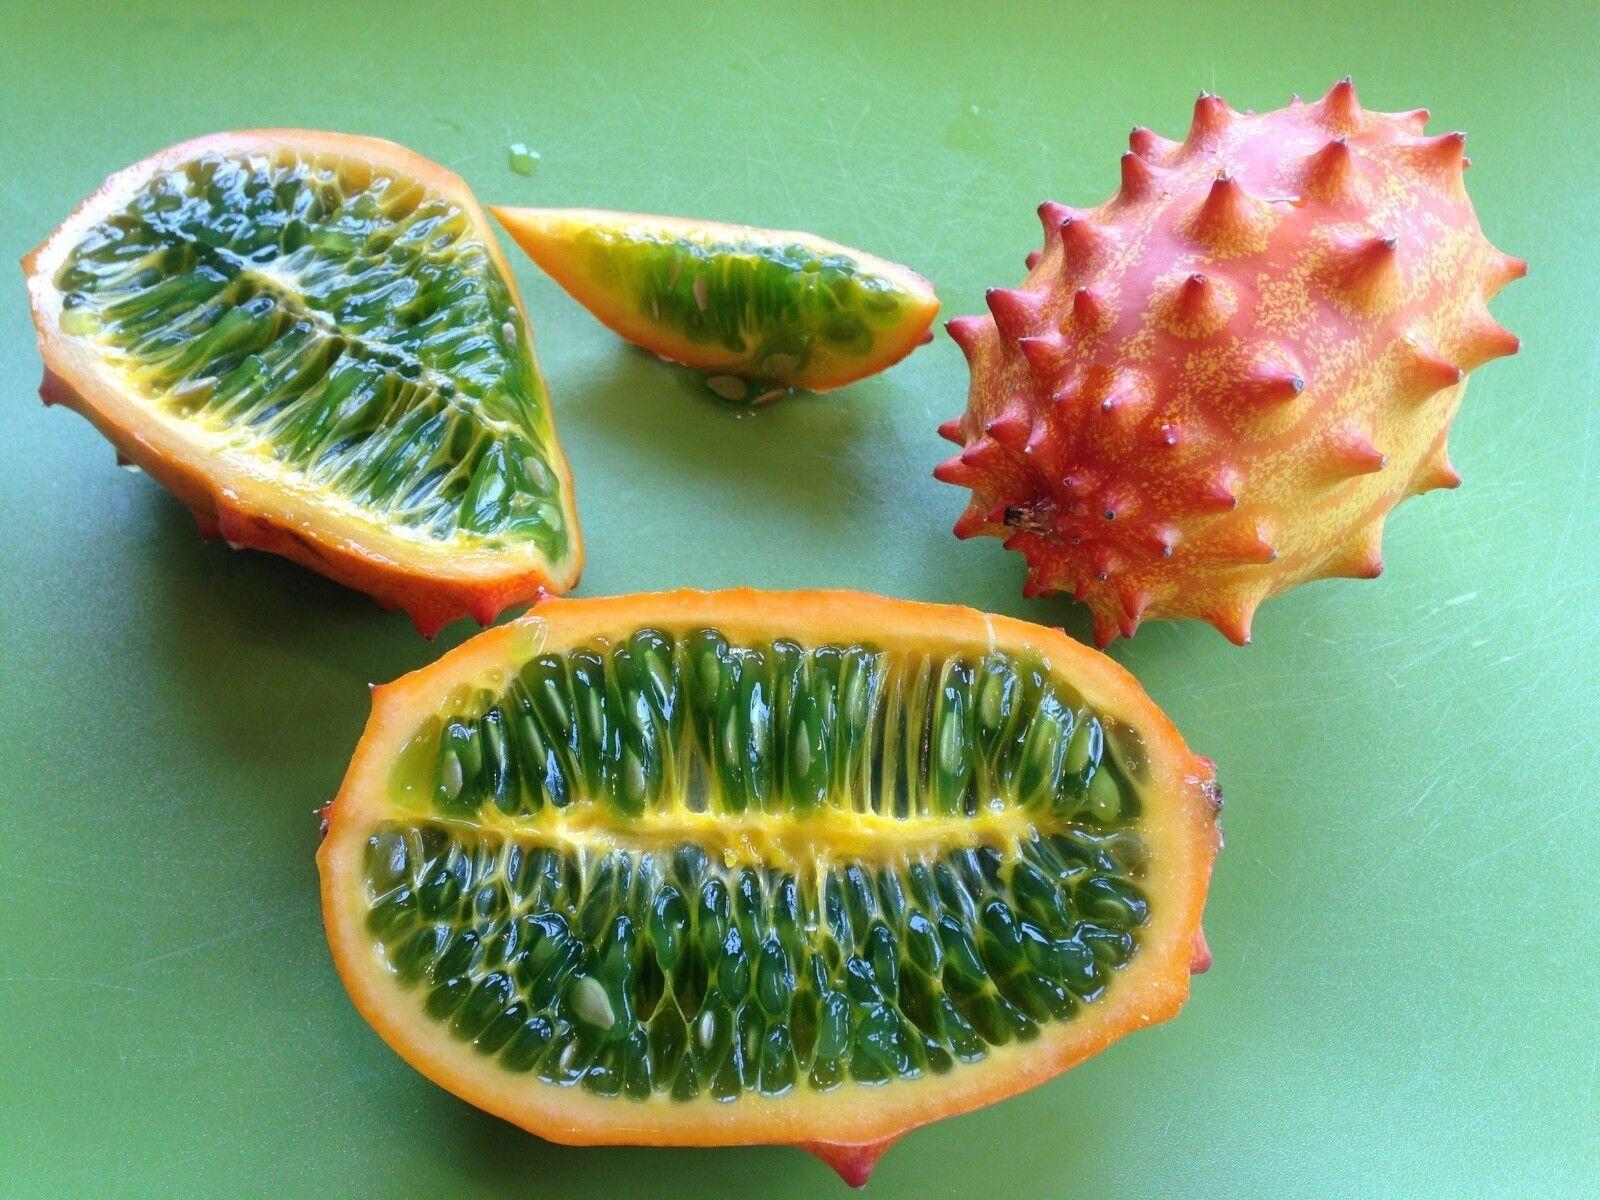 kiwano melon-Horn melon-jelly melon-20 Finest Seeds